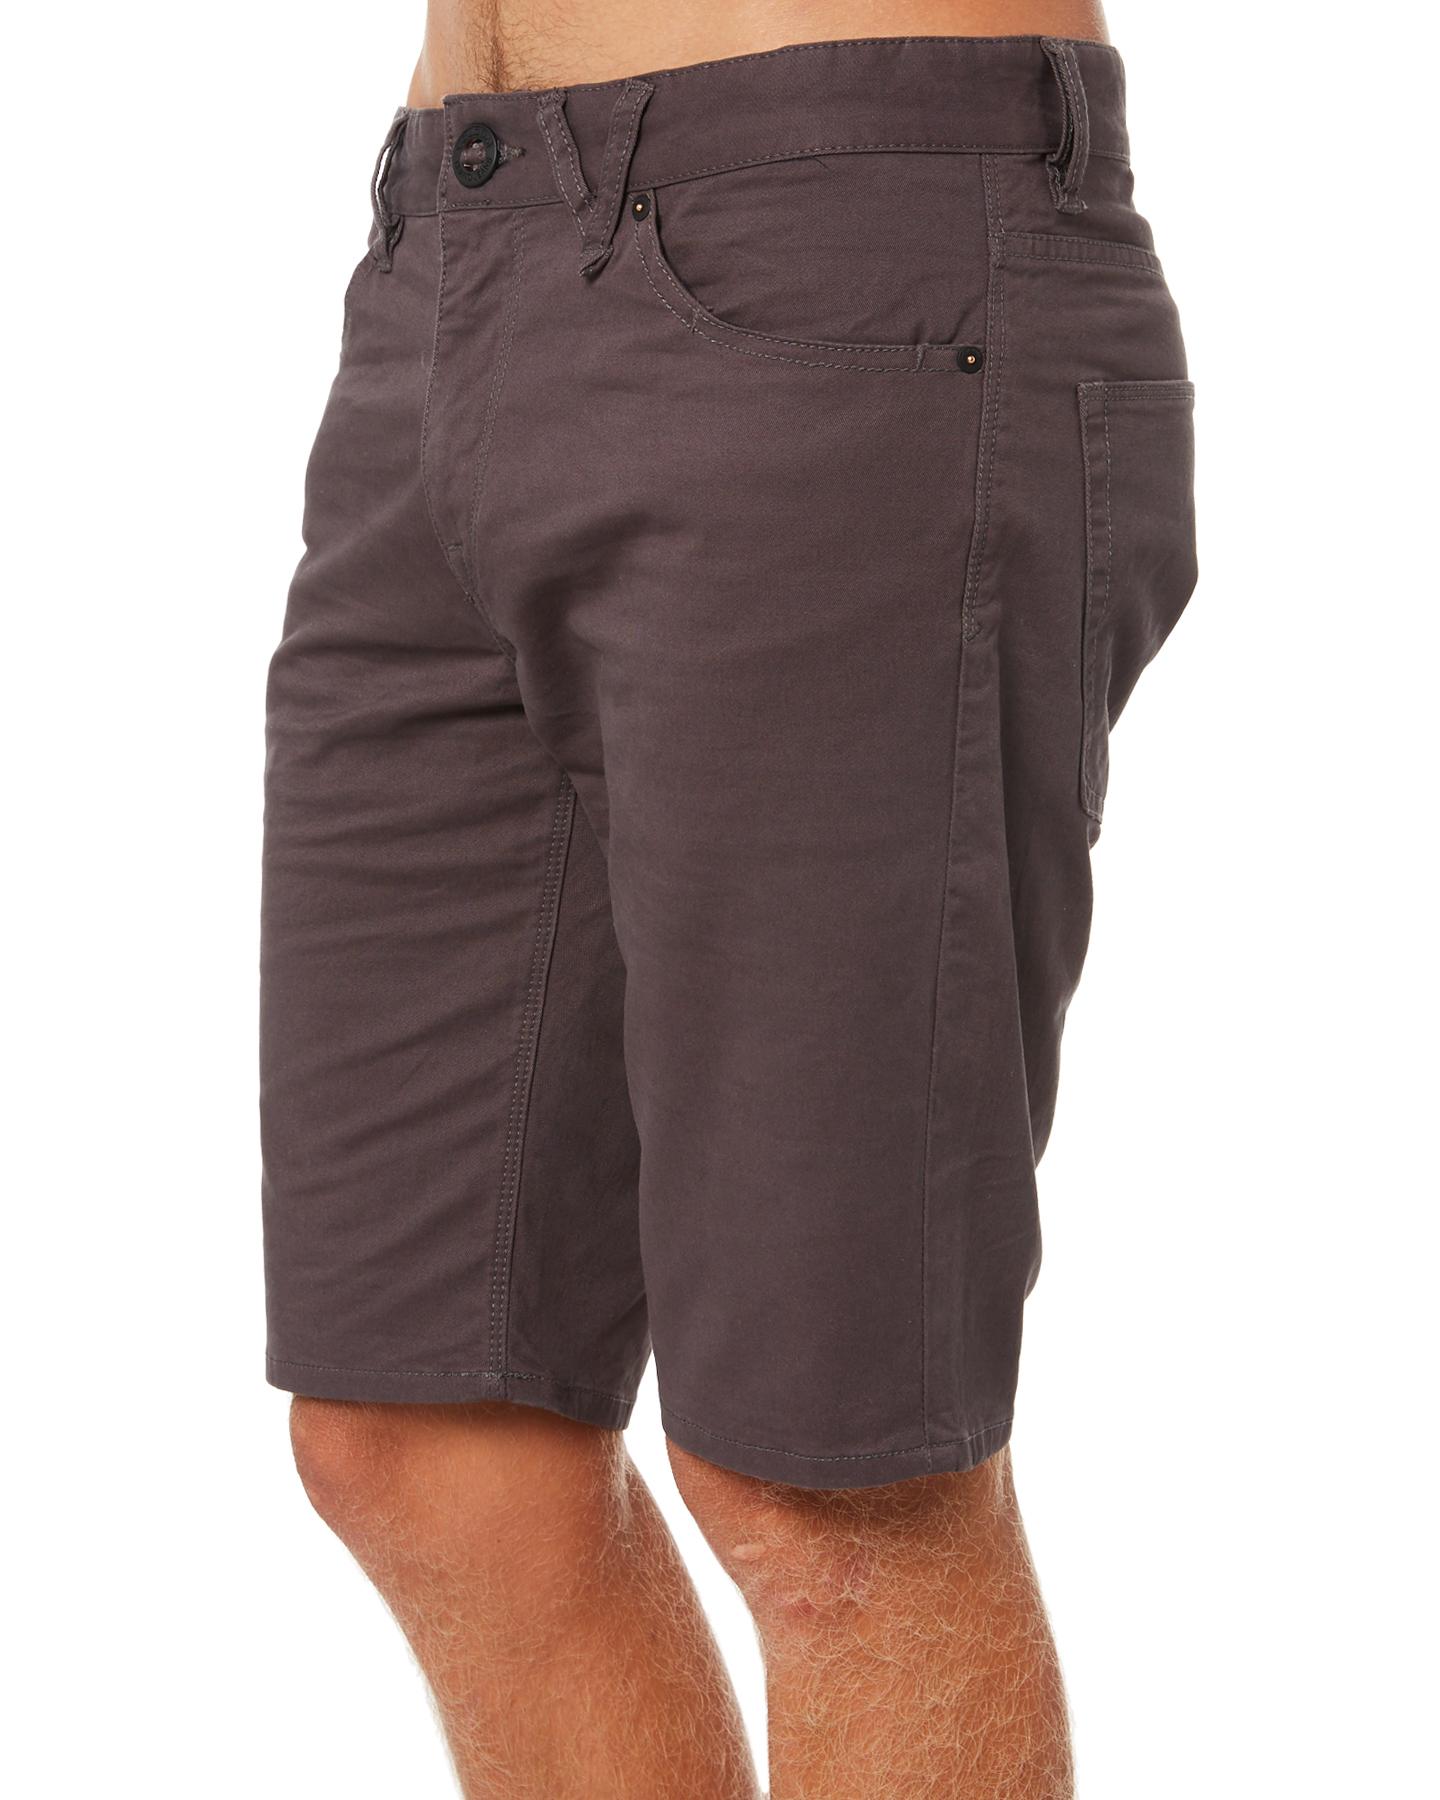 ebf1f1568c Volcom Men's Solver Lite Mens 5 Pocket Short Mens Shorts Bermudas Grey 30  Navy A0931606NVY for sale online | eBay